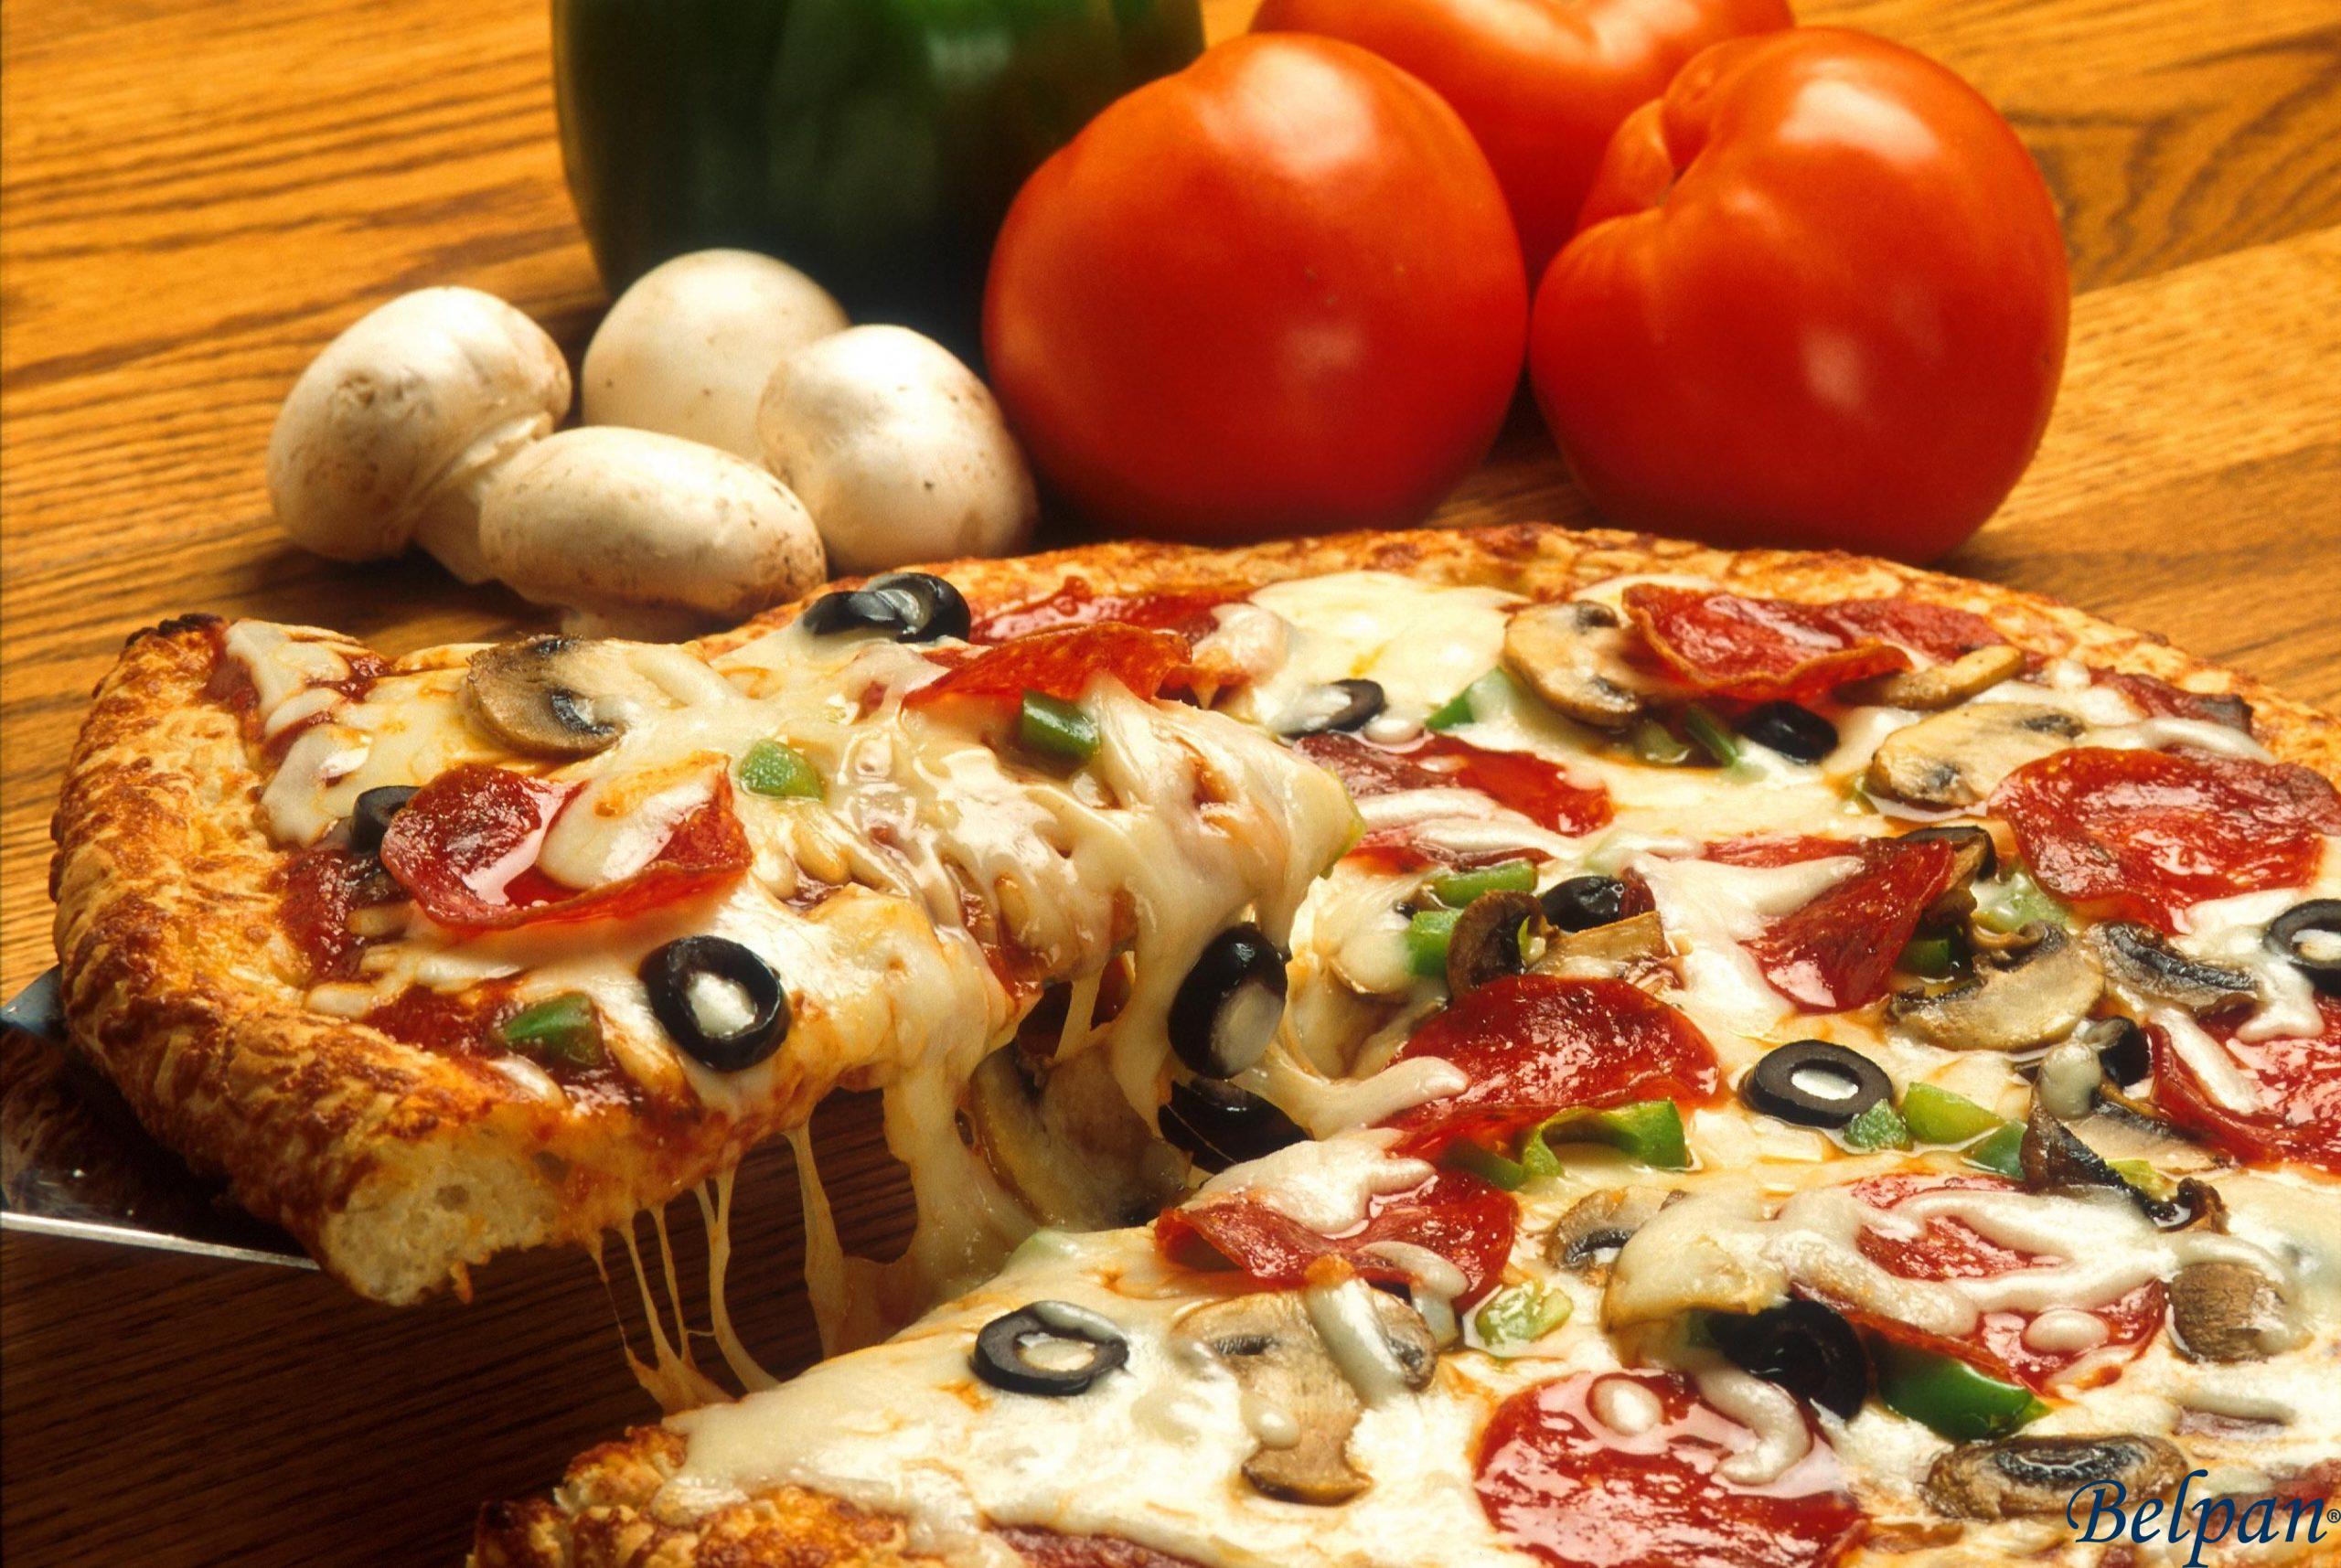 Pizza Belpan Suceava Dumbraveni